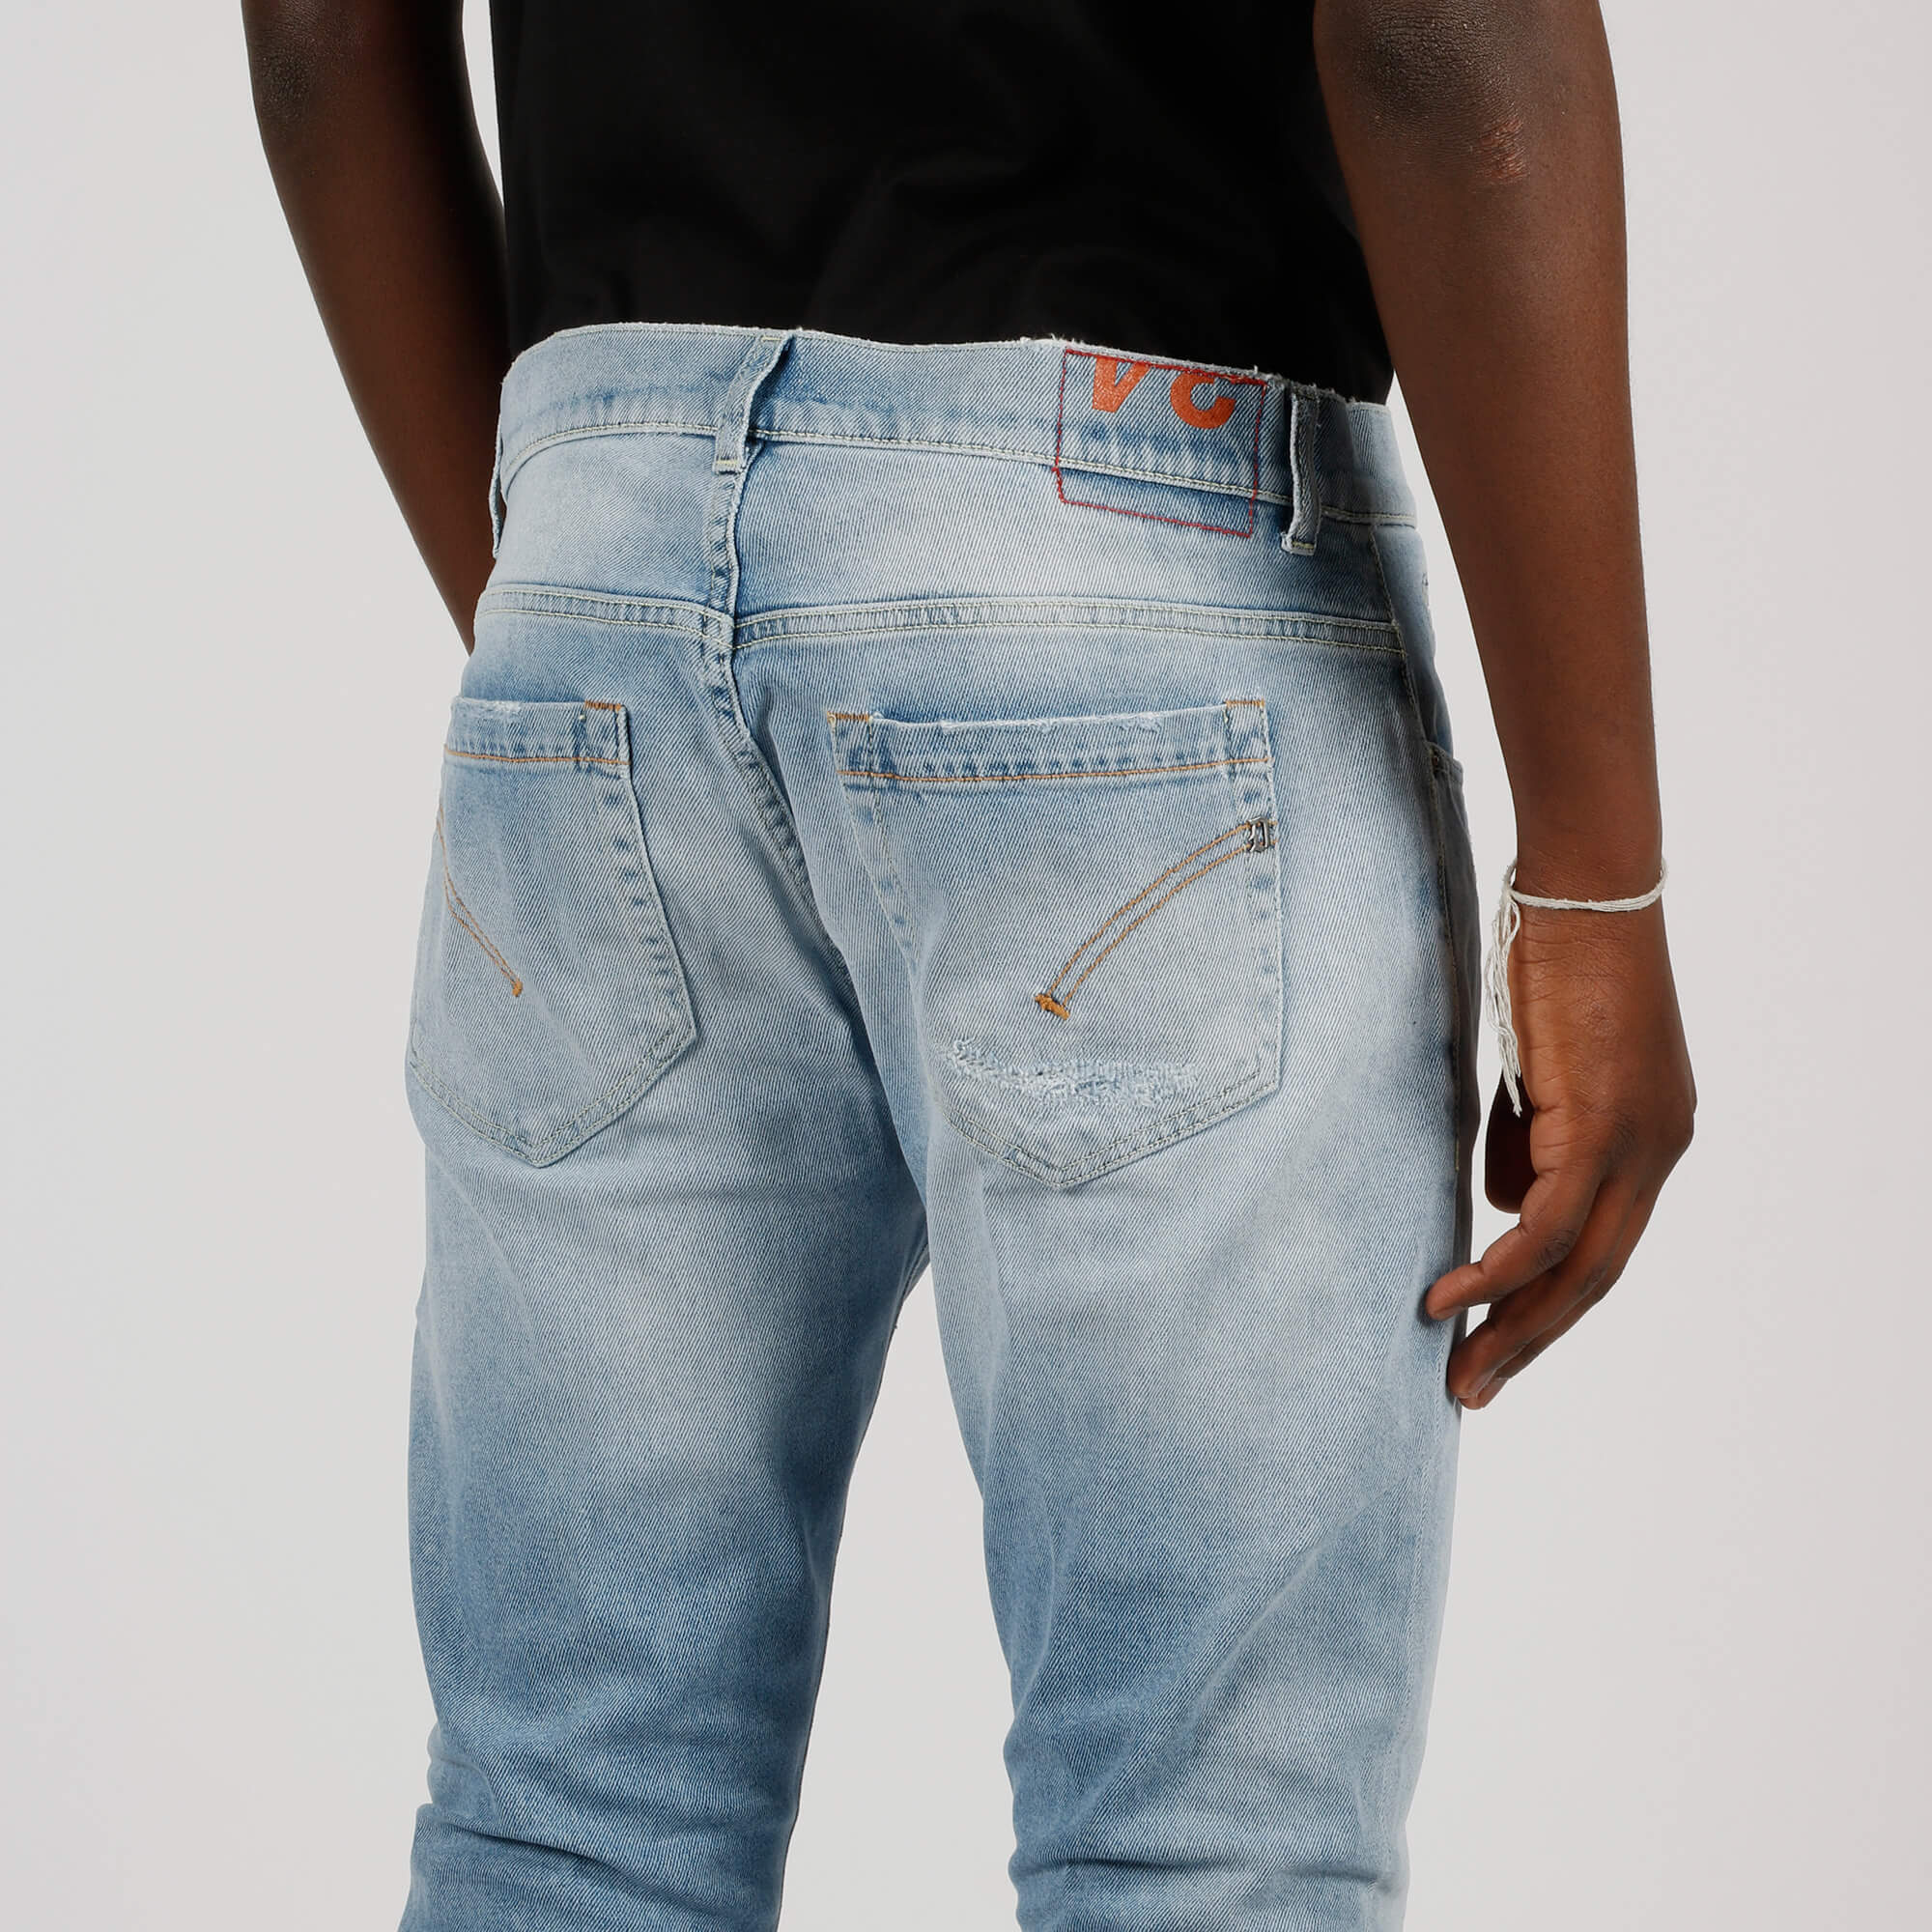 Jeans george - Denim chiaro